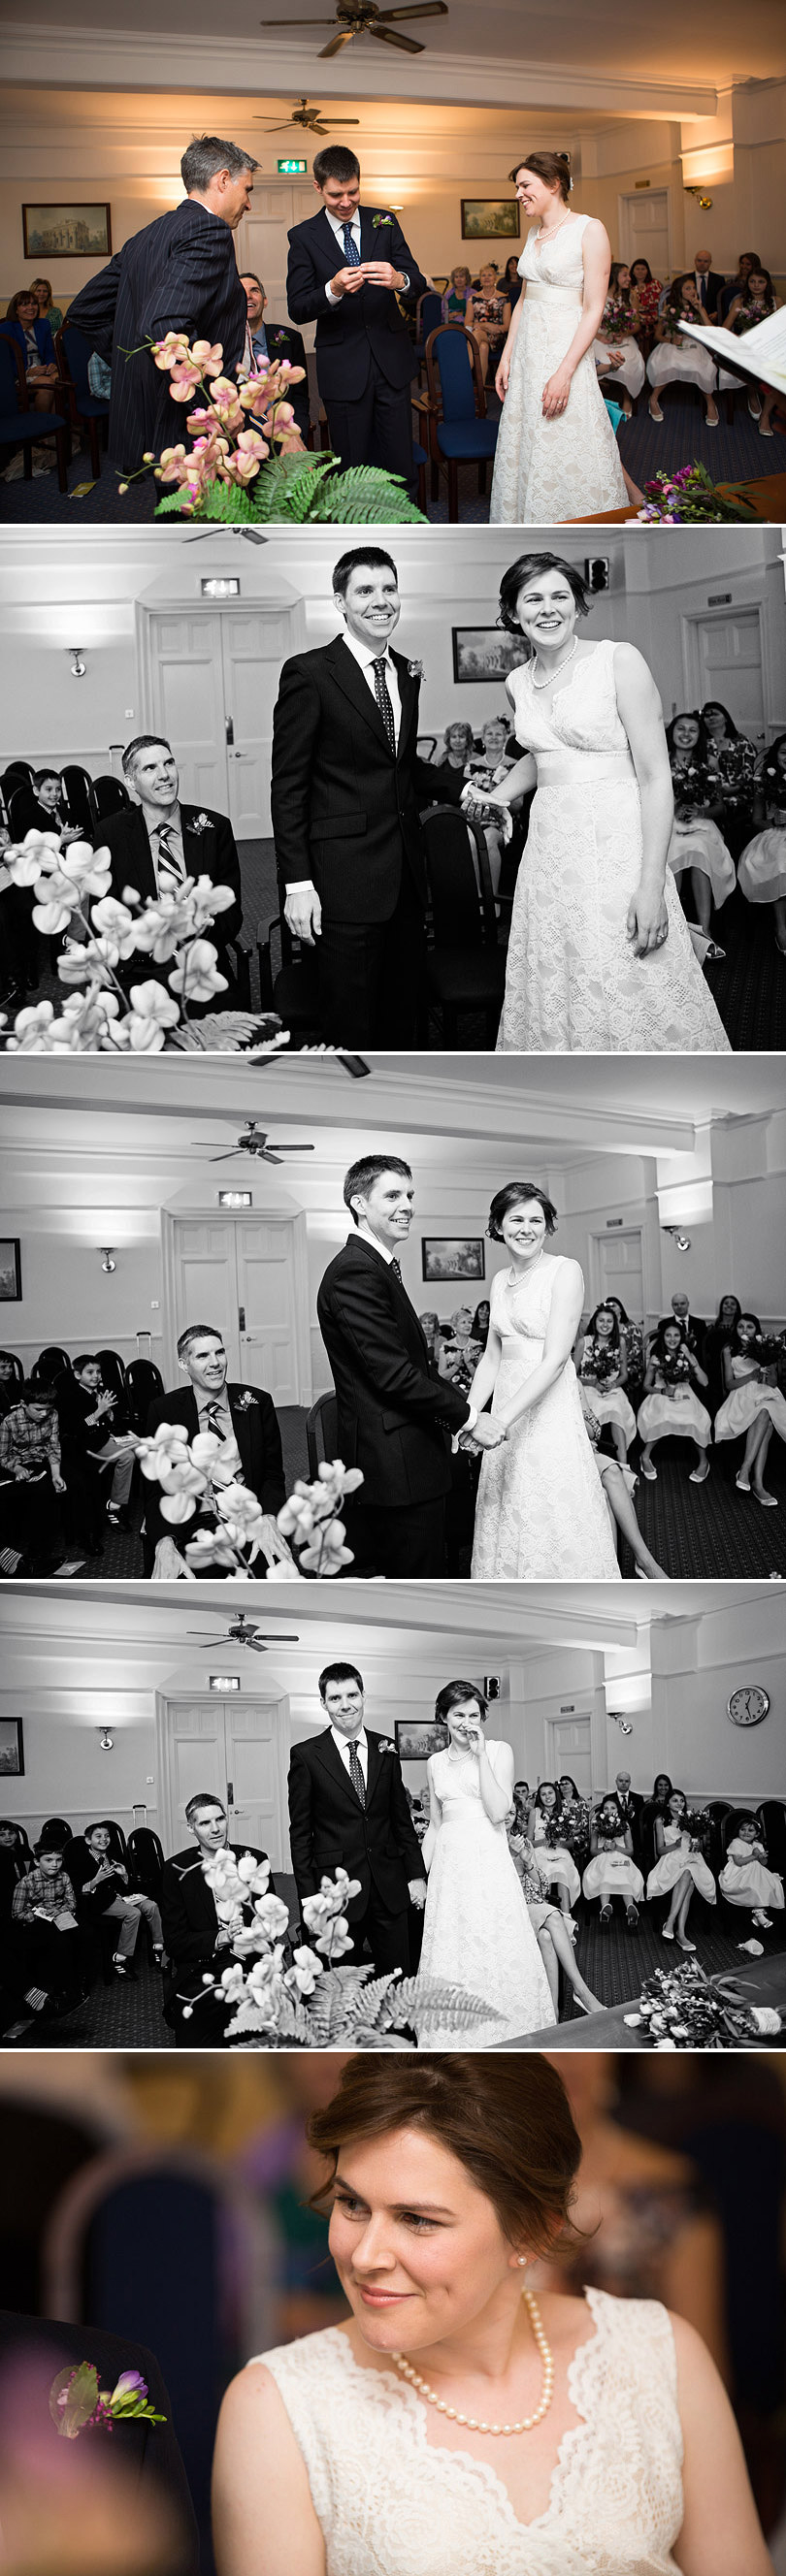 Rachel&Sam-Ealing-Wedding_08.jpg